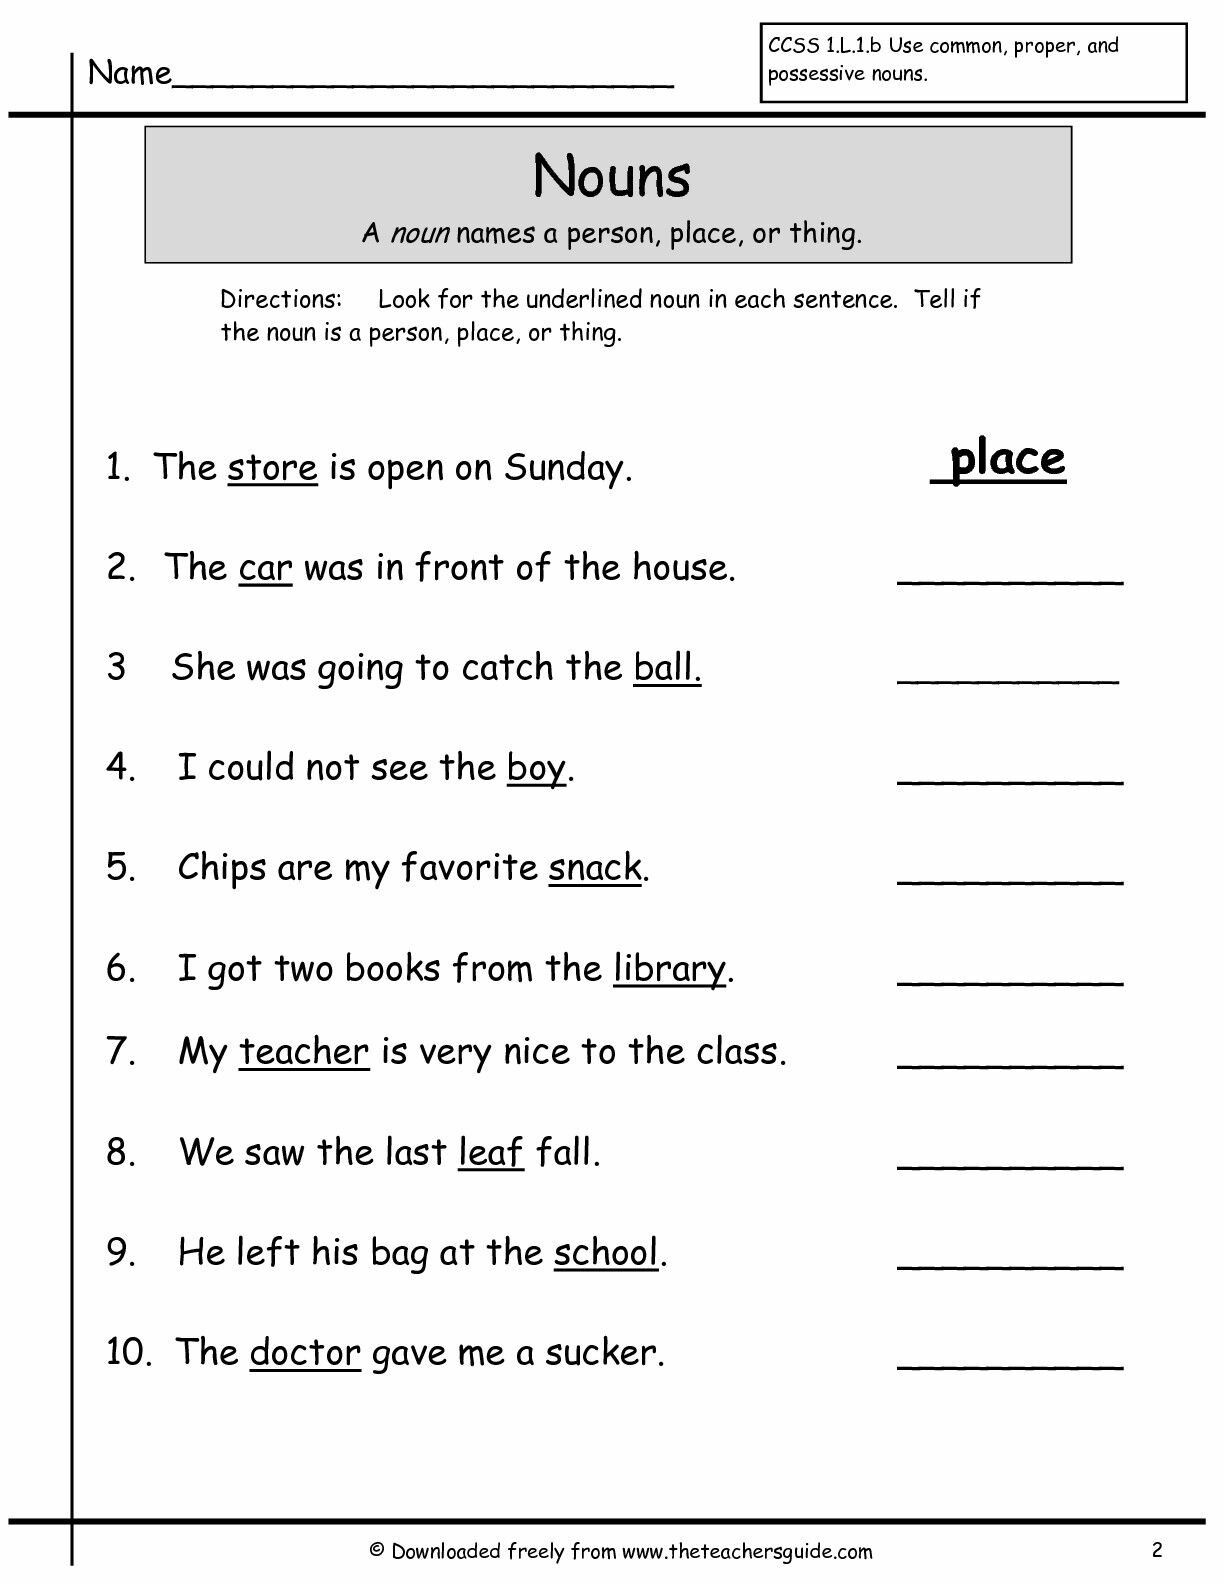 hight resolution of Pin by jazmin on Classwork   Nouns worksheet